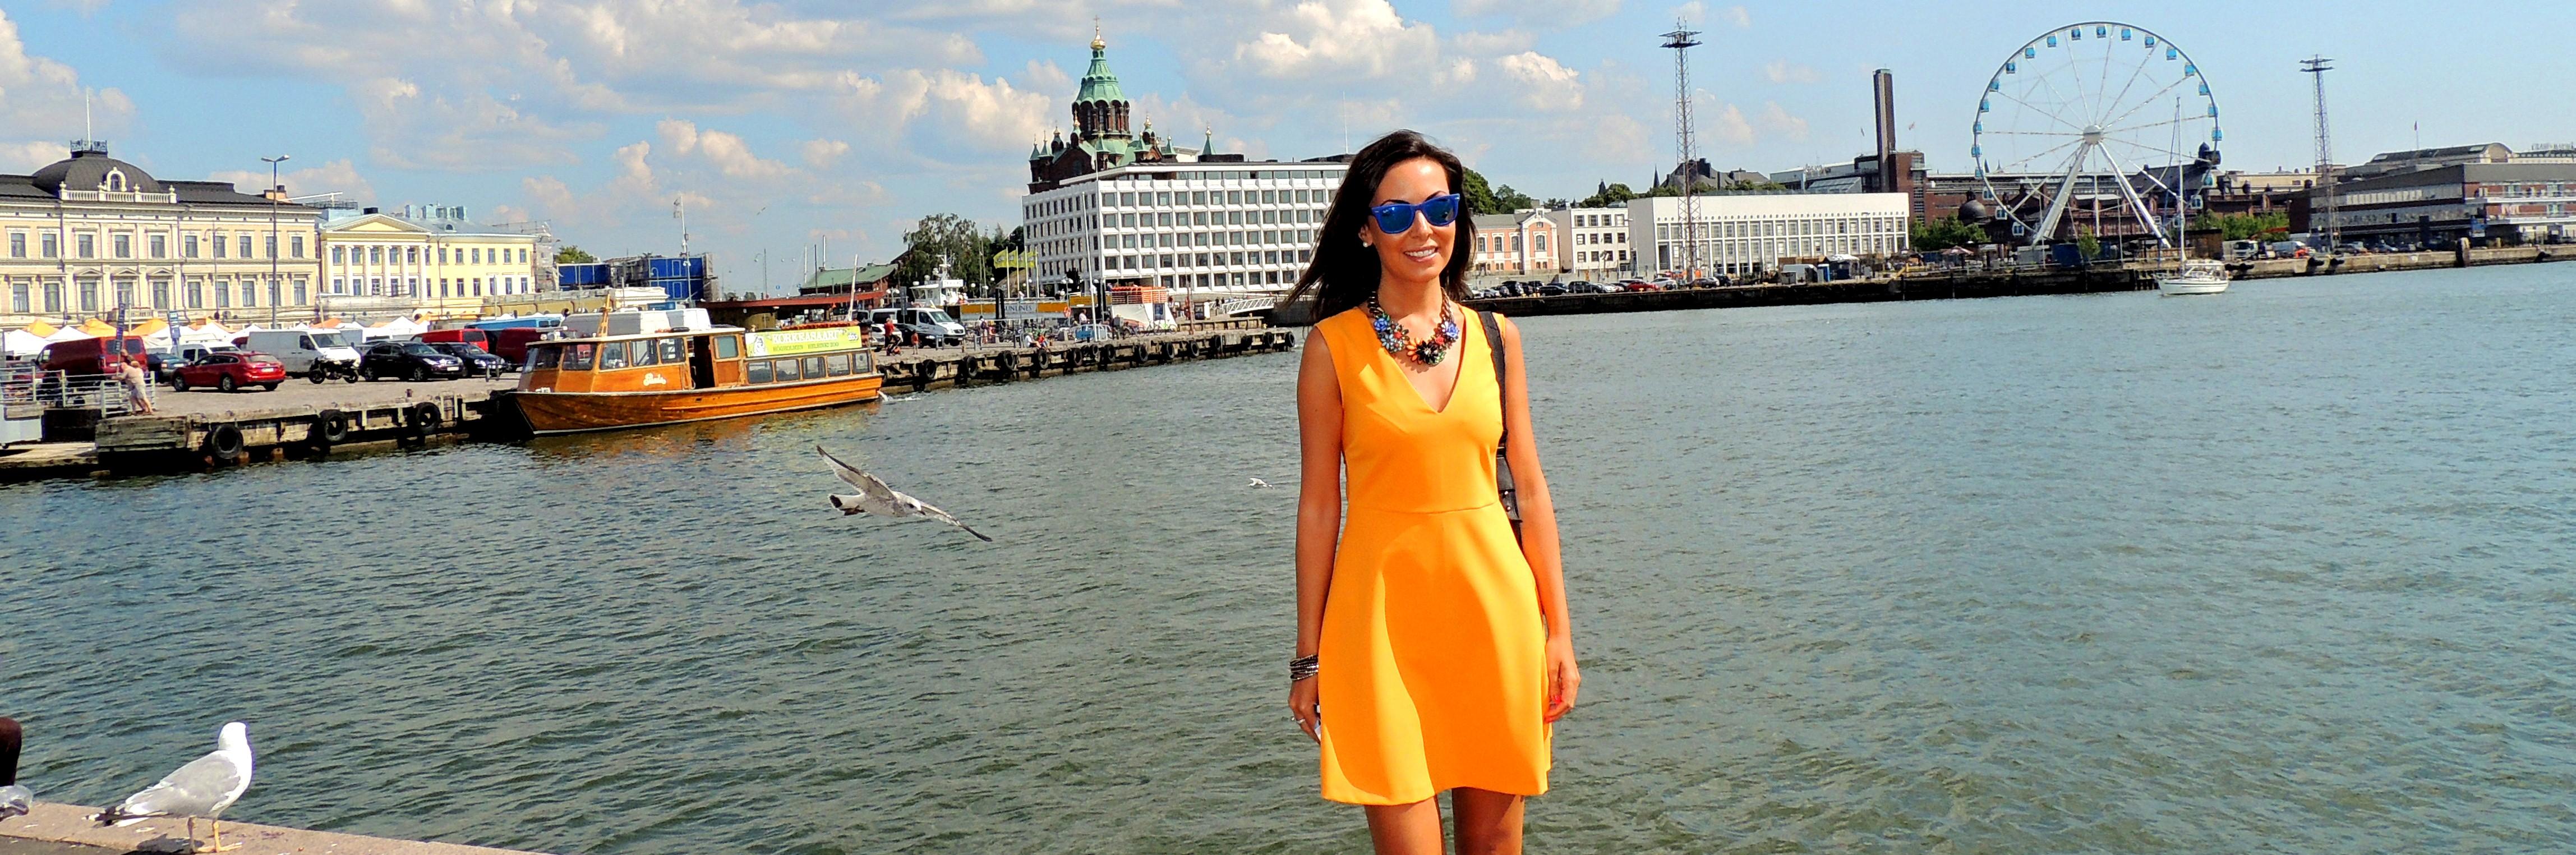 Shades of Tangerine, Helsinki